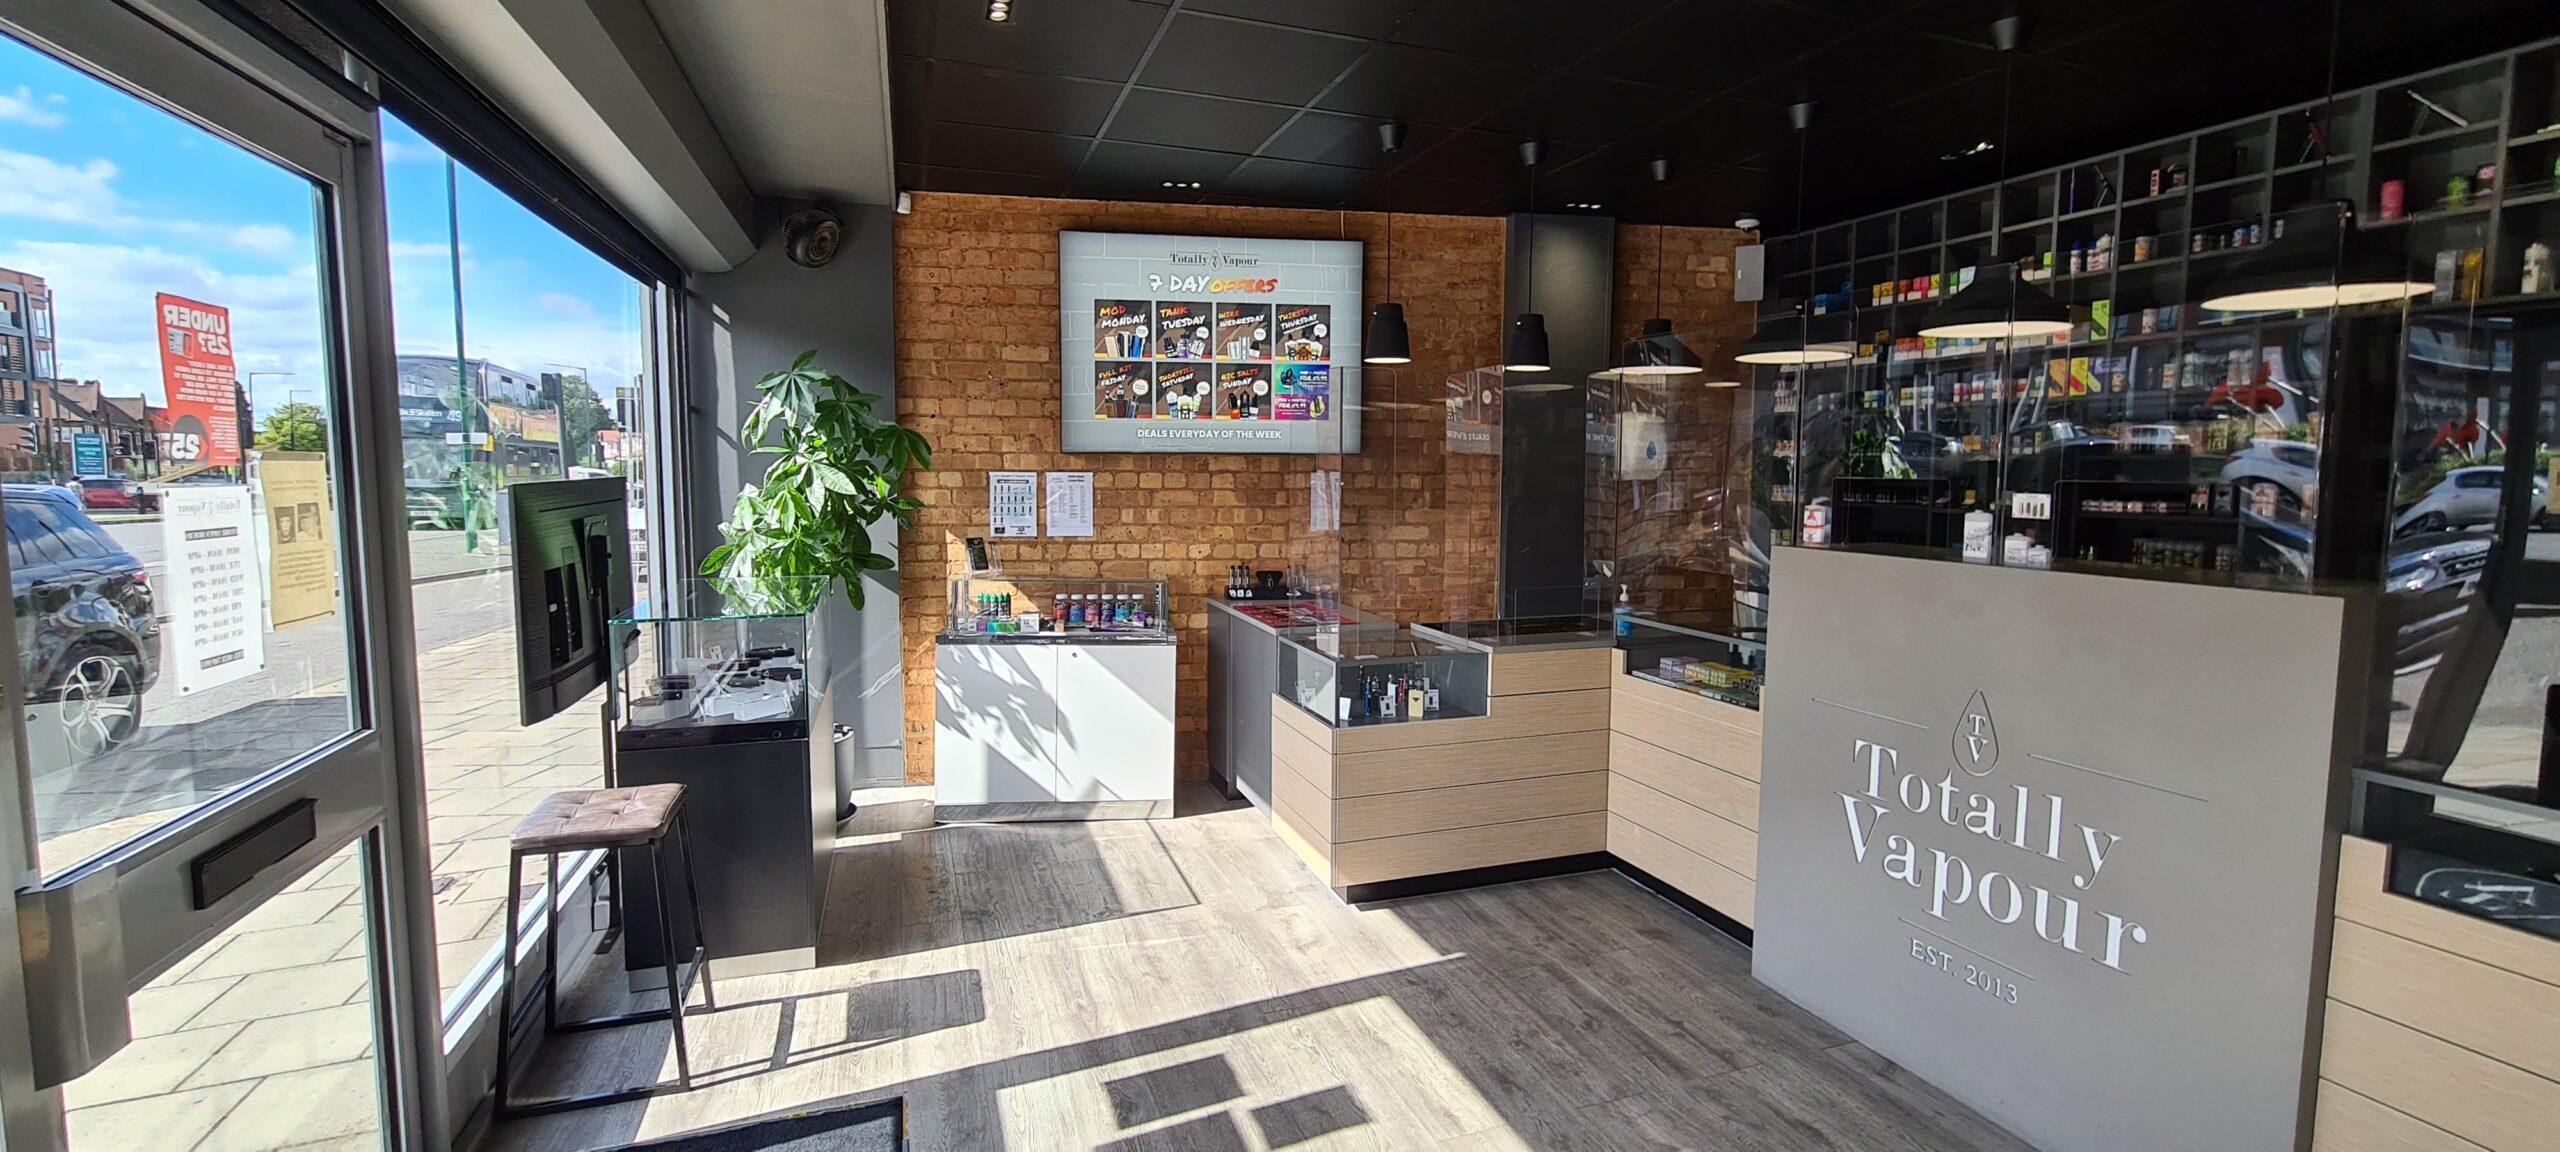 Inside Solihull Vape Shop